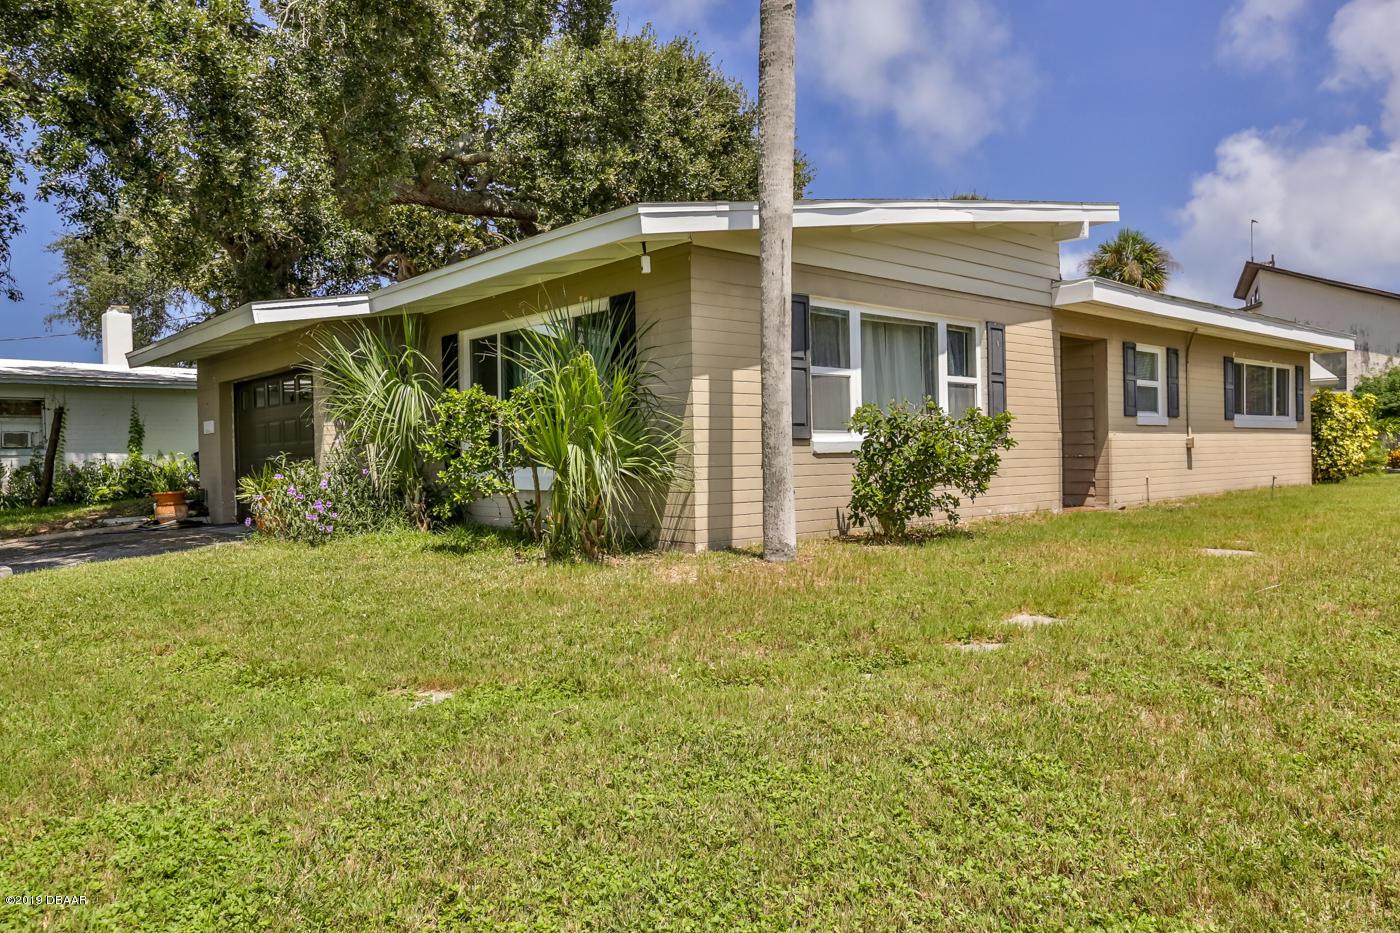 Photo of 1149 John Anderson Drive, Ormond Beach, FL 32176